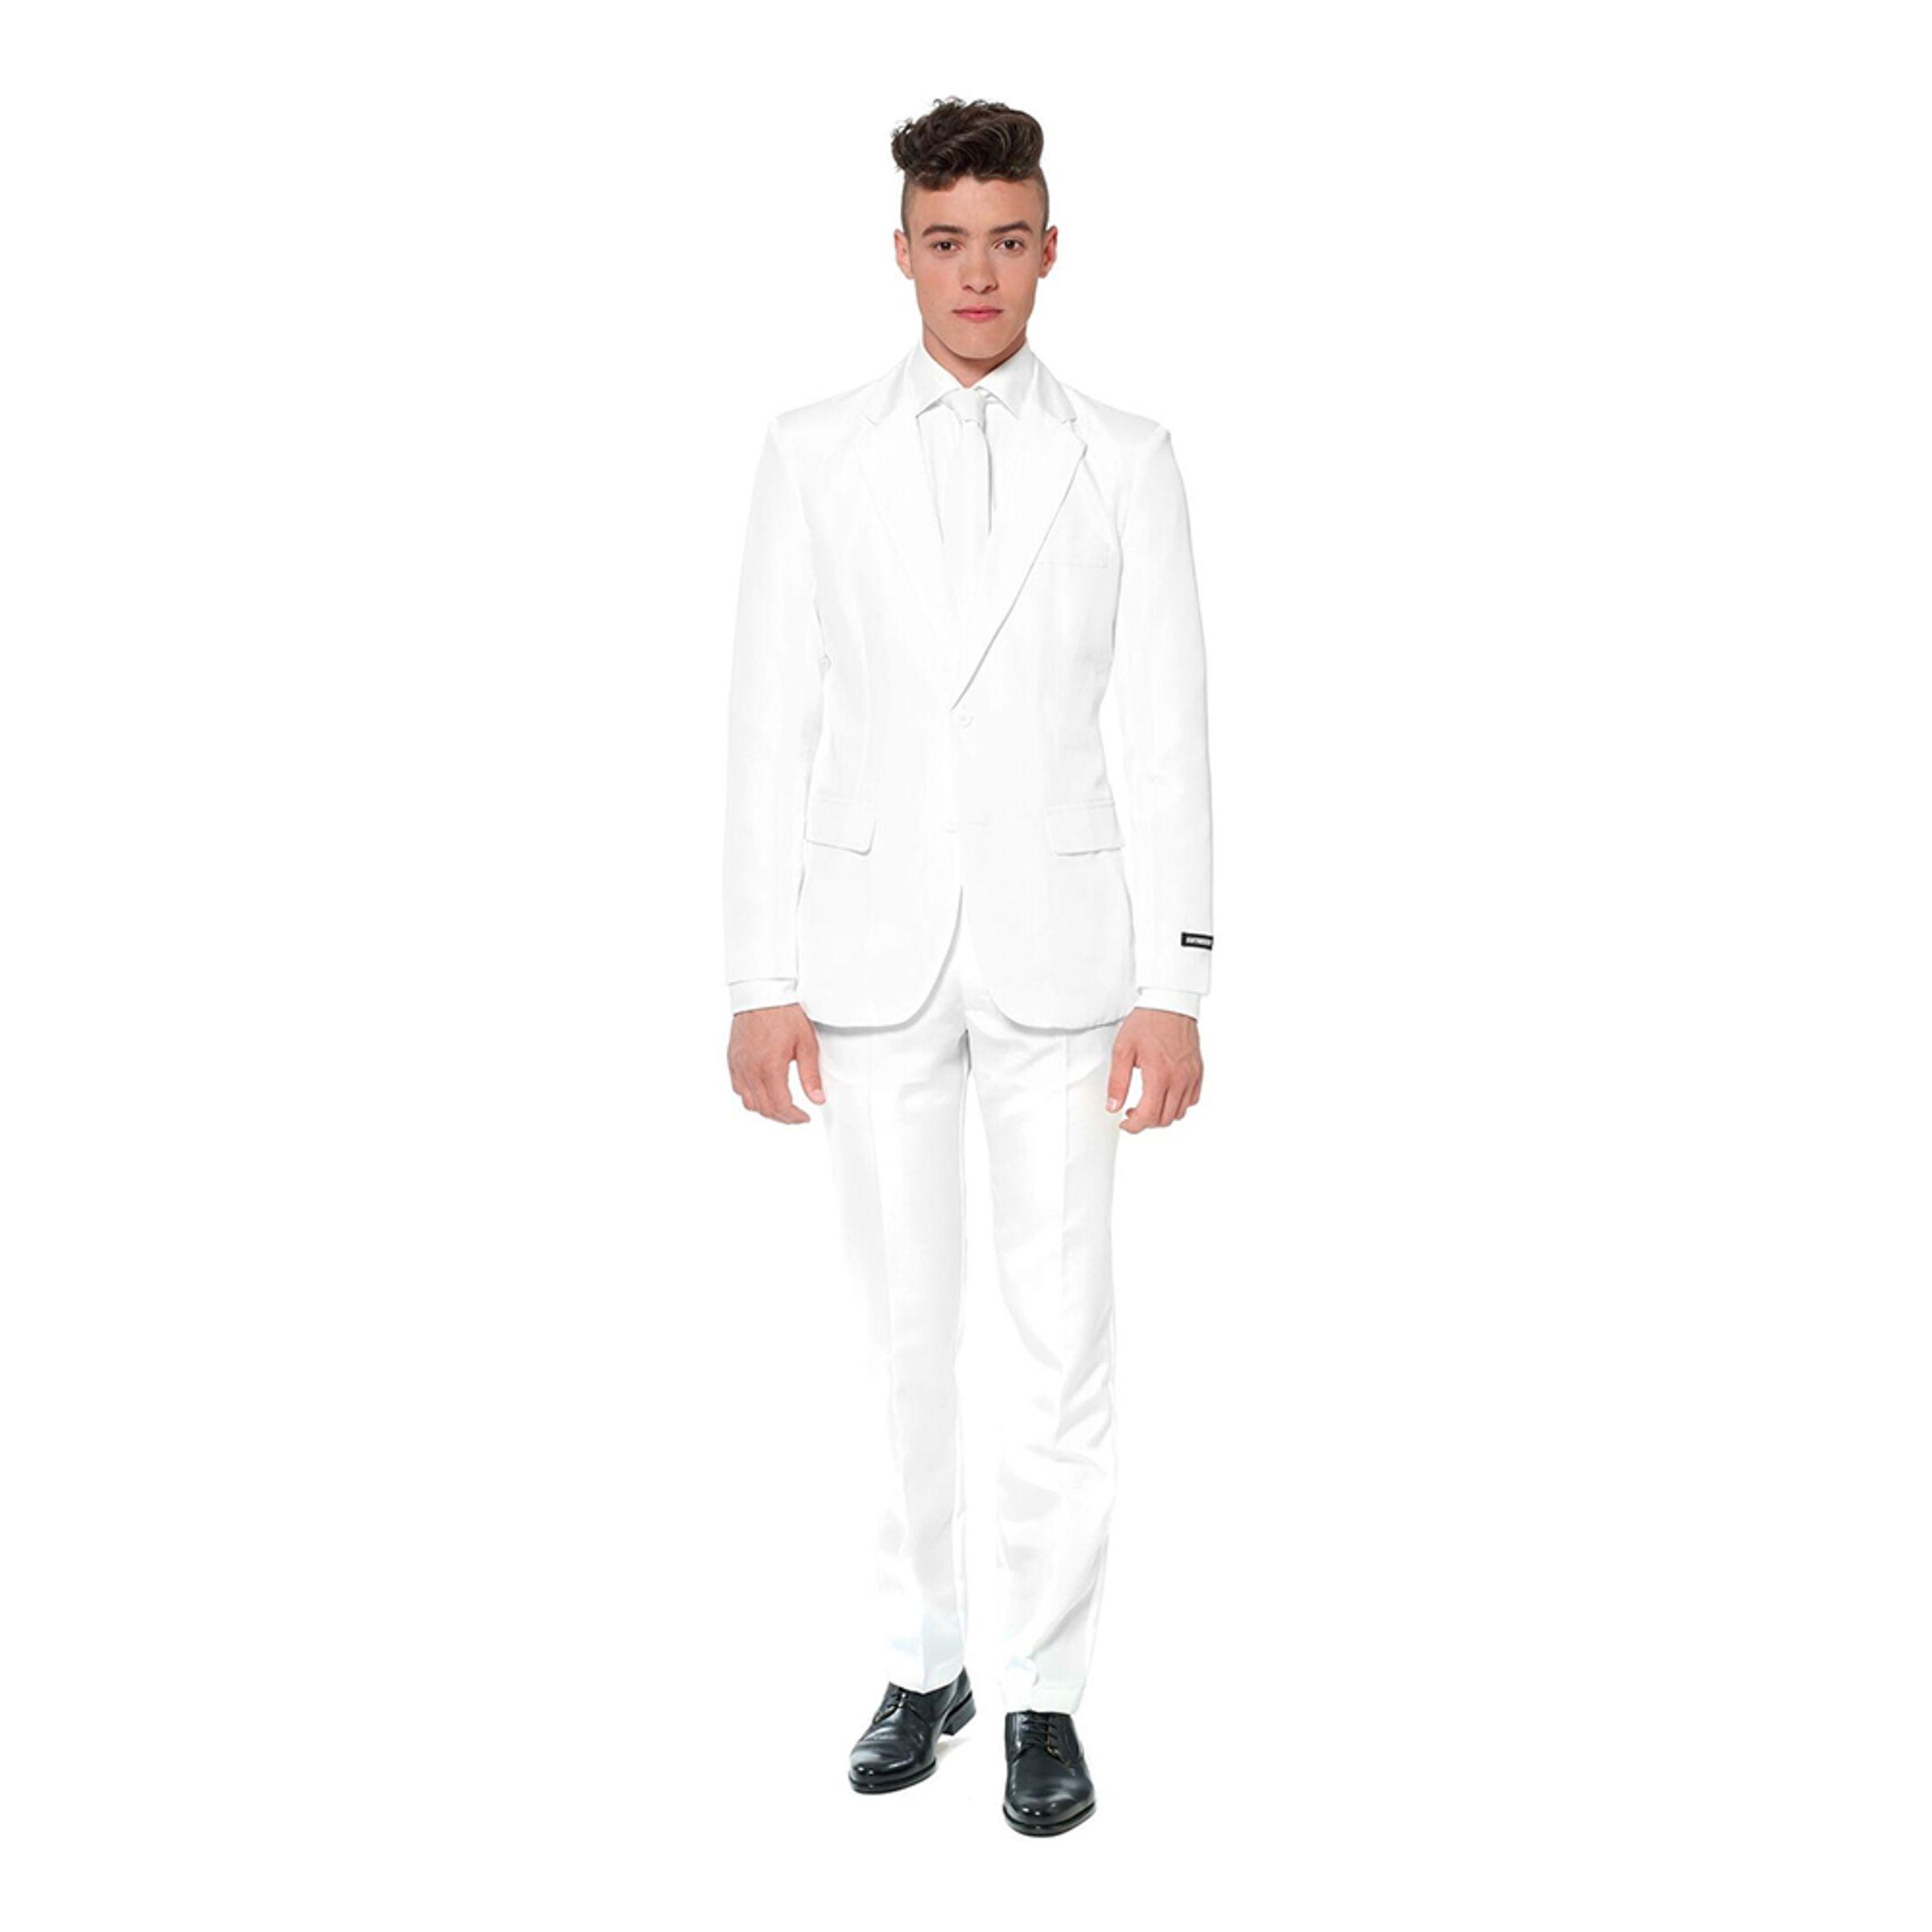 Suitmeister Vit Kostym - X-Large